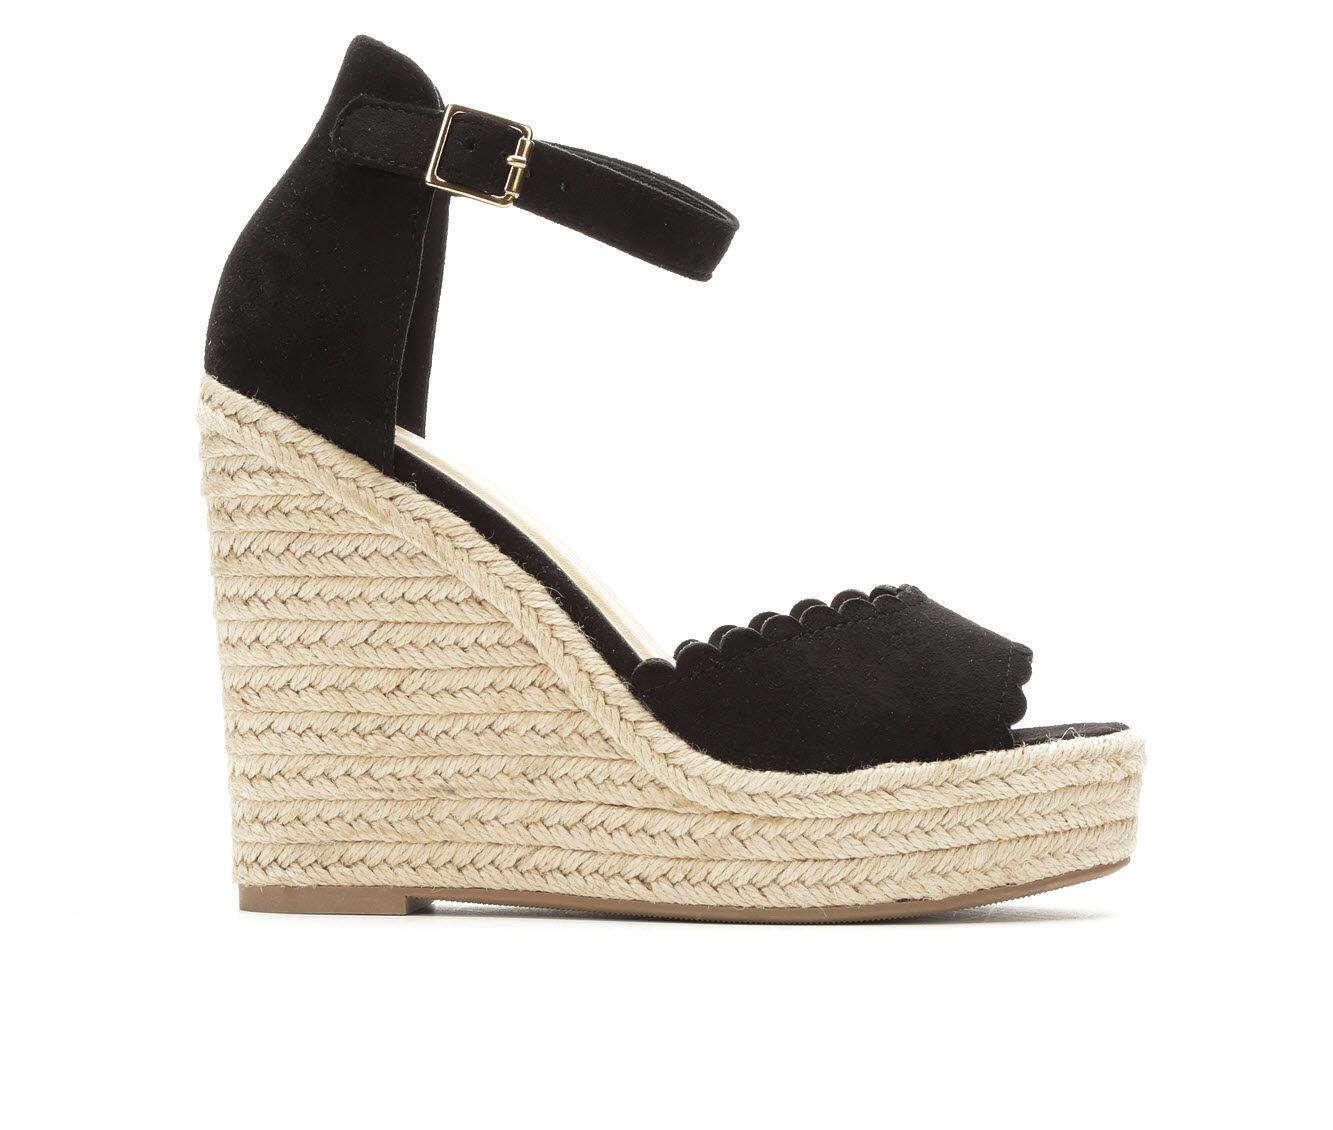 Good Quality Women's Y-Not Herald Wedge Sandals Black